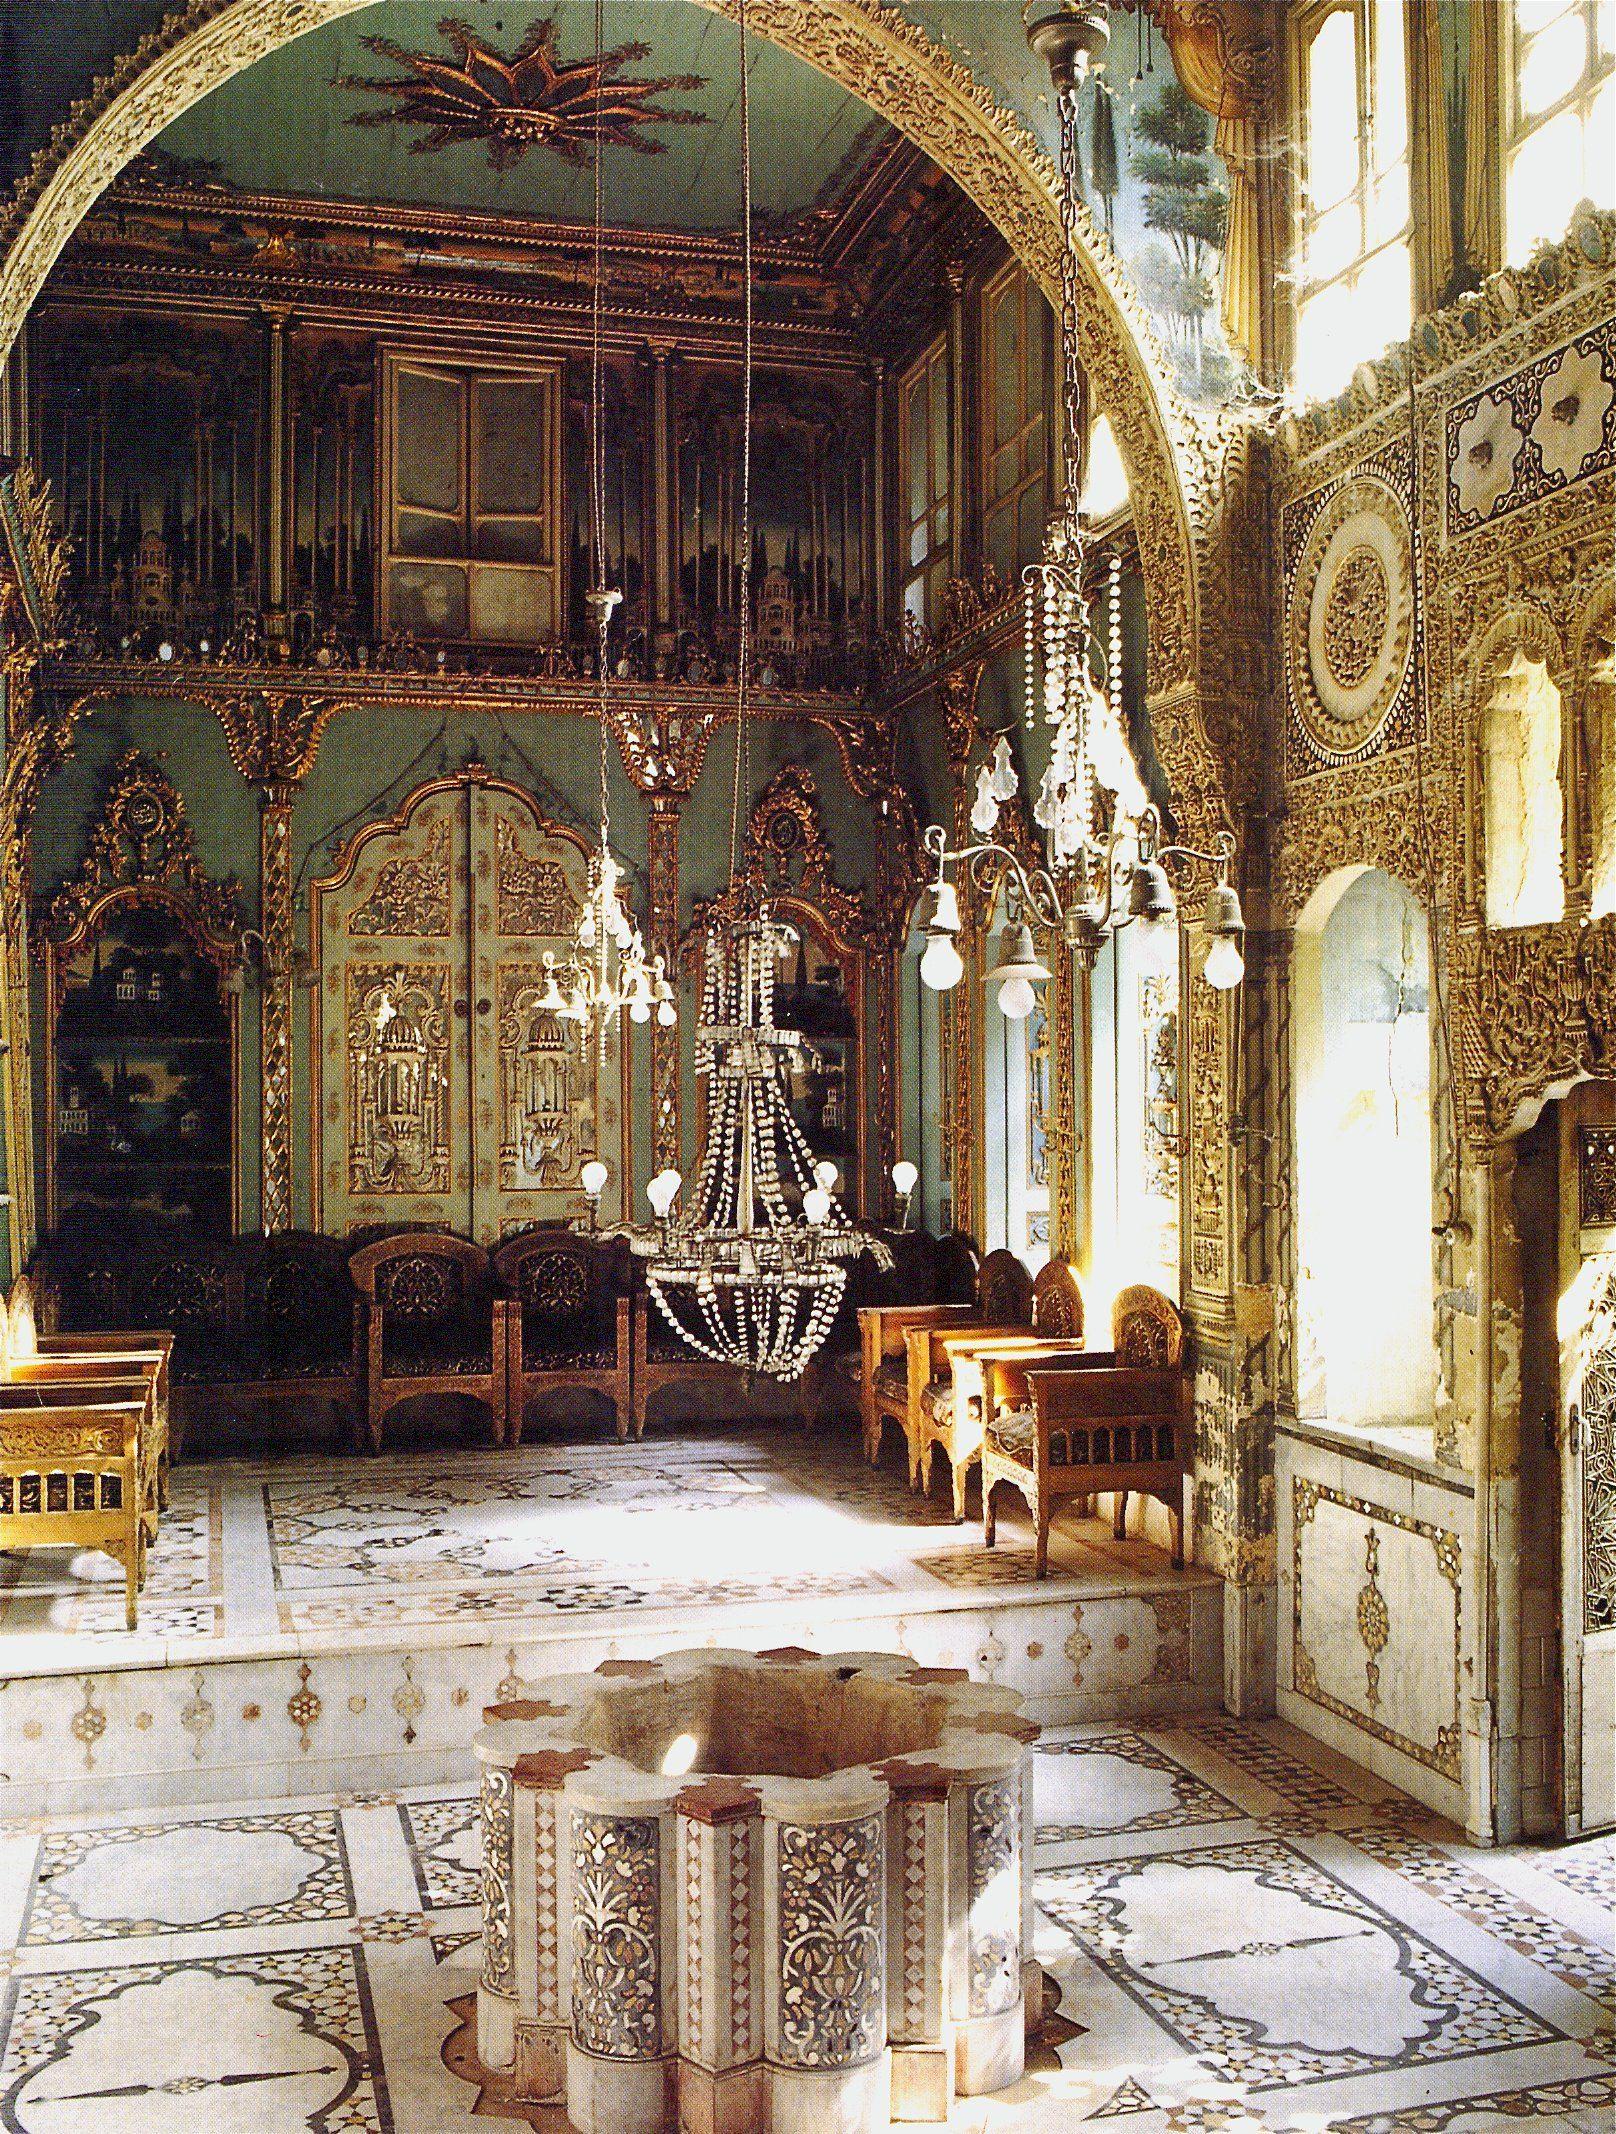 Beit mujalled damascus iran world of interiors french emirats arabes unis also syria lebanon rh pinterest